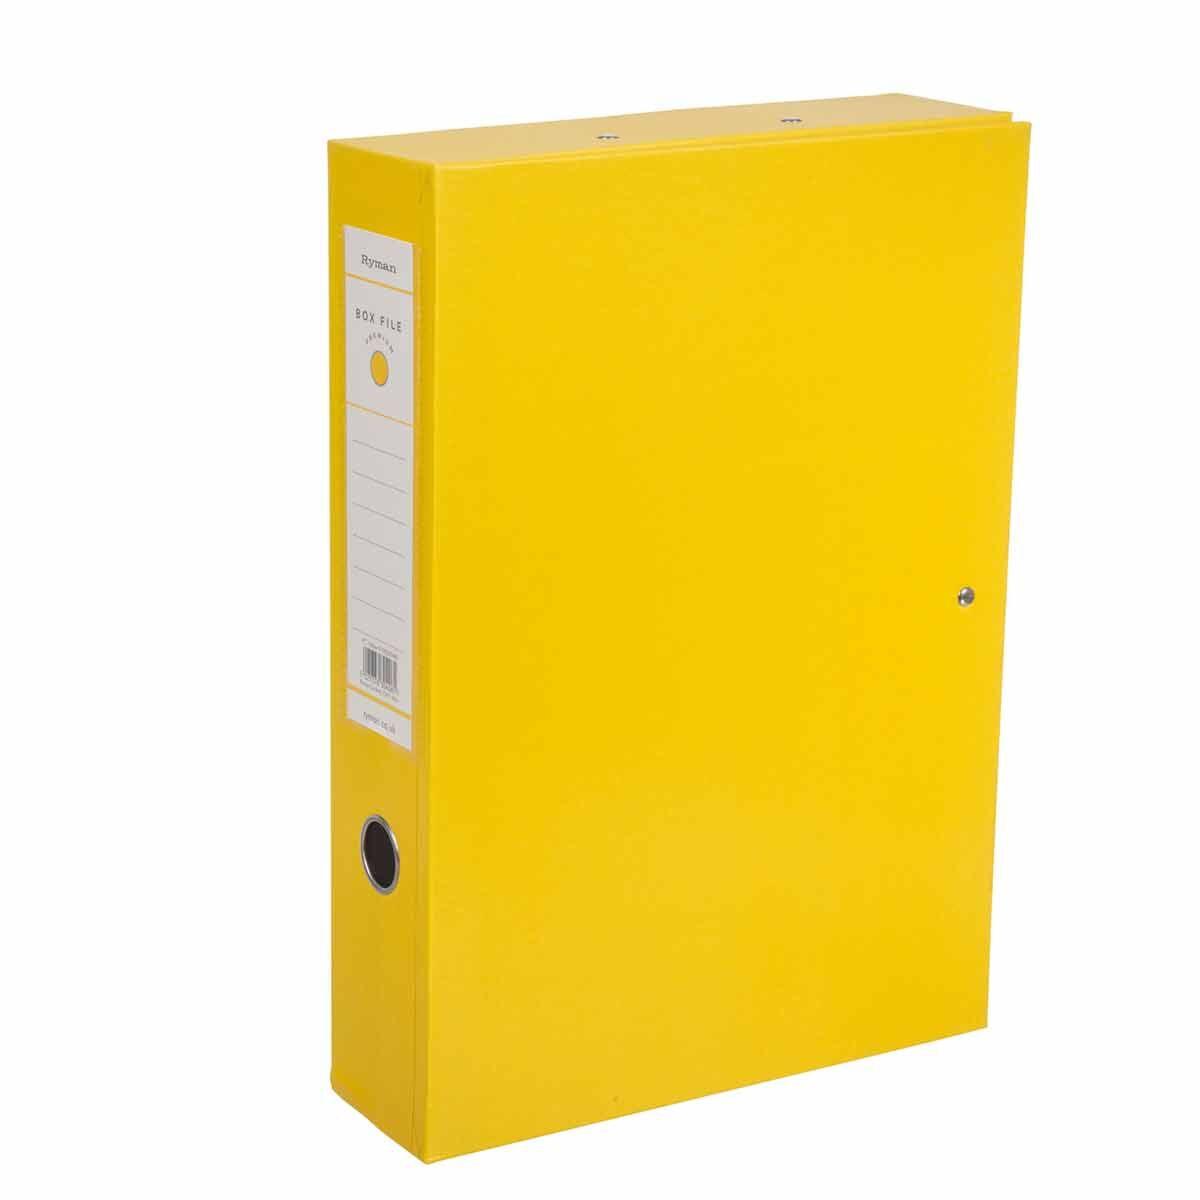 Ryman Premium Box File Foolscap Pack of 10 Yellow